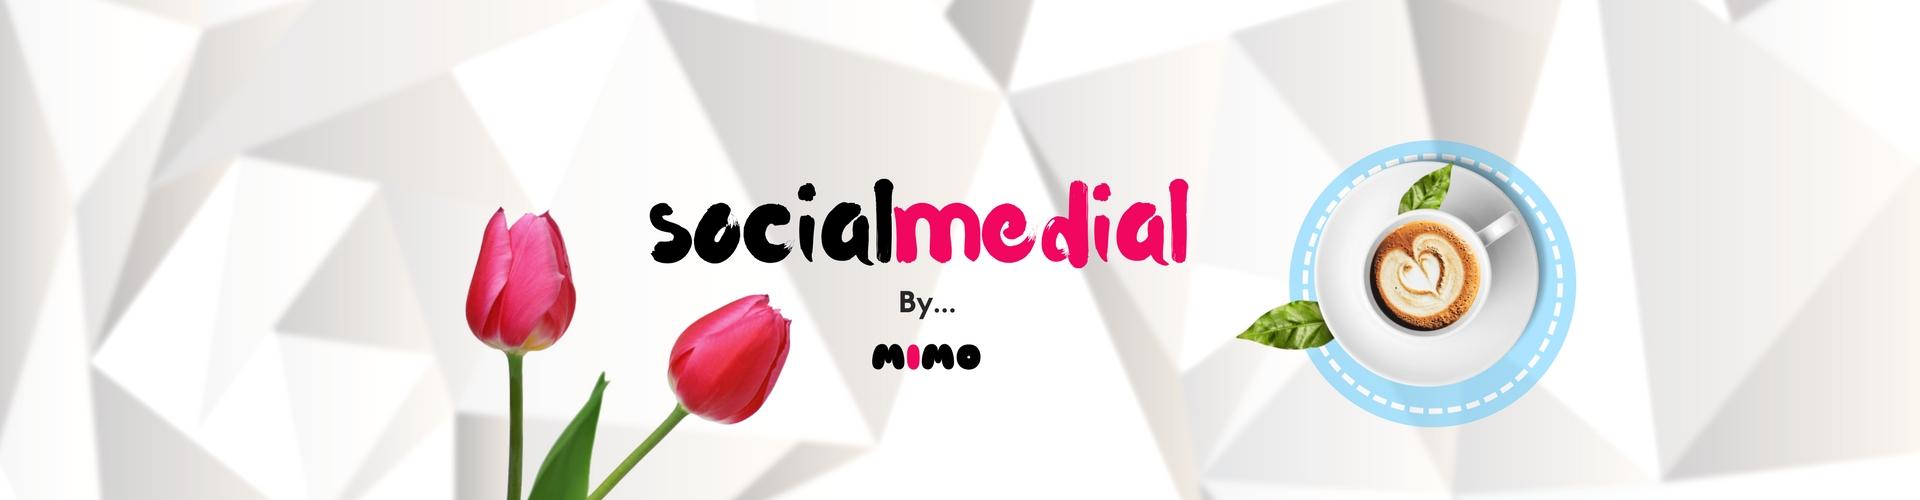 Obsługa social media agencja interaktywna Instagram Facebook